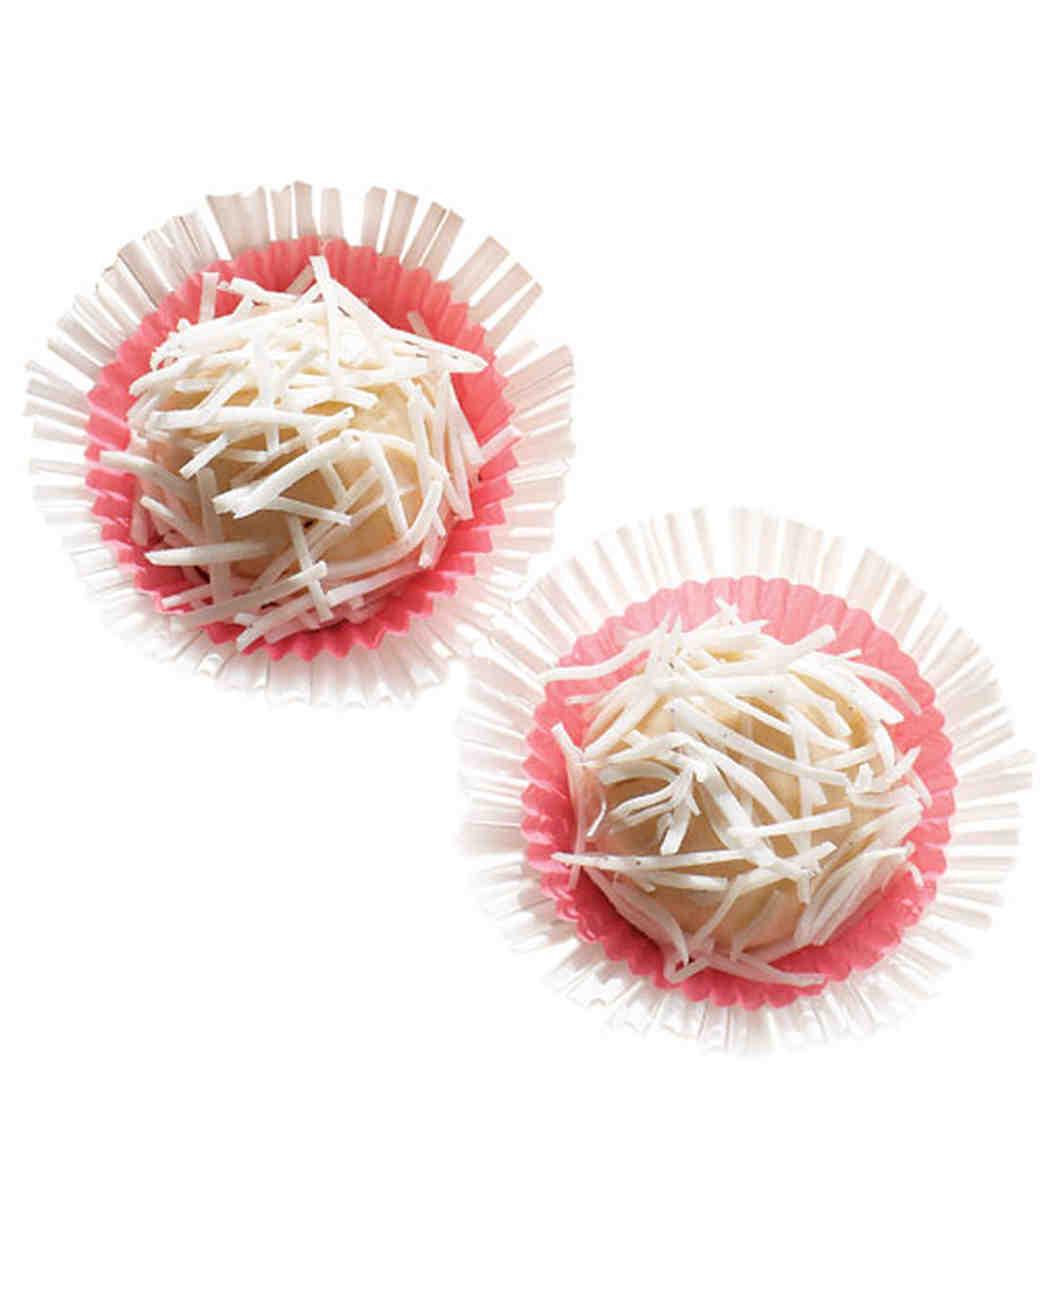 Wedding Cake Cookies Martha Stewart: Coconut-Coated Cookie Recipe